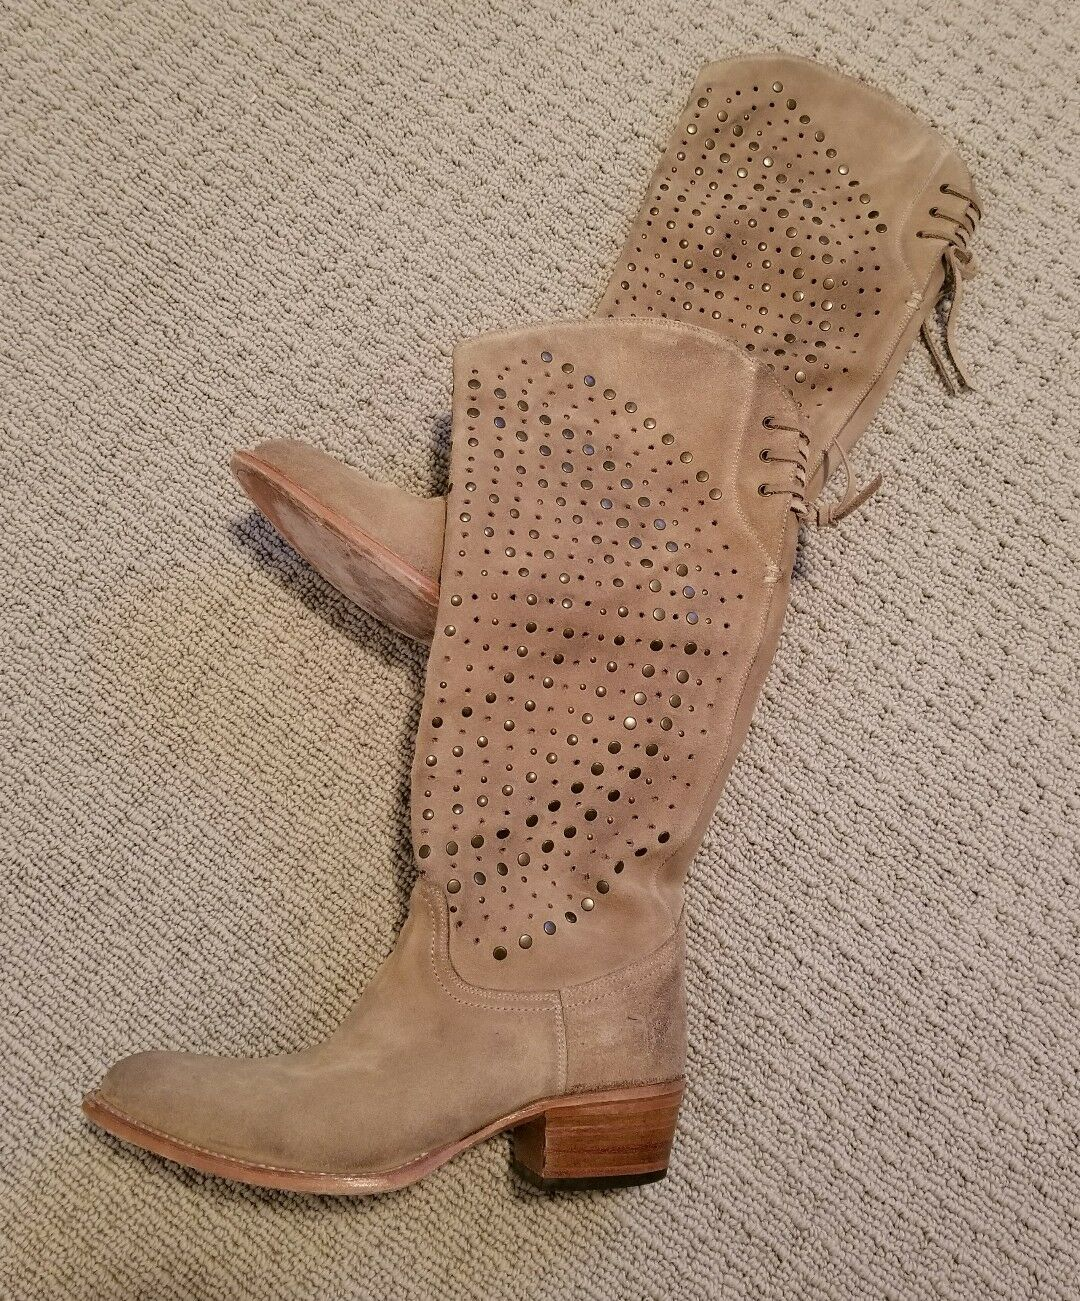 FRYE Deborah Lace Back Studded Tall Stiefel damen SZ 7 Sand Suede  498